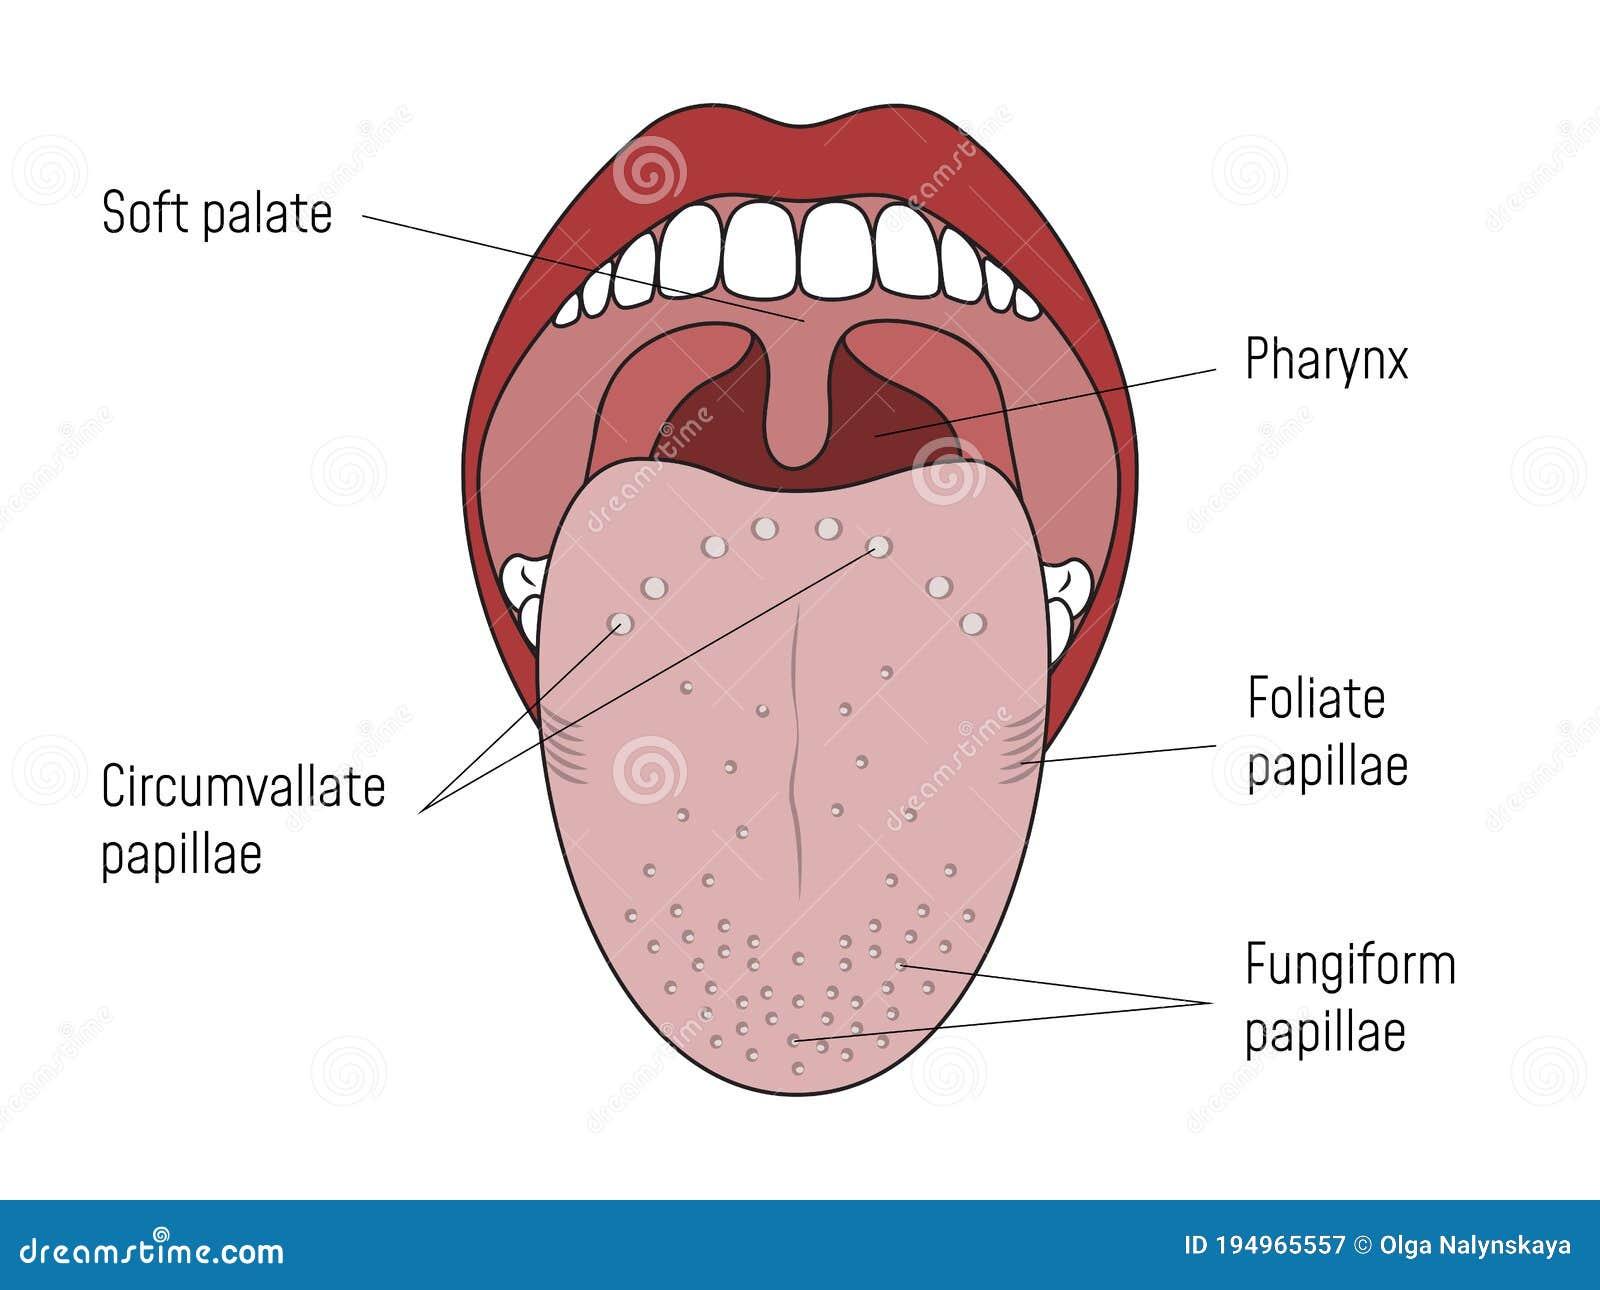 vallate papillae nyelv kezelése